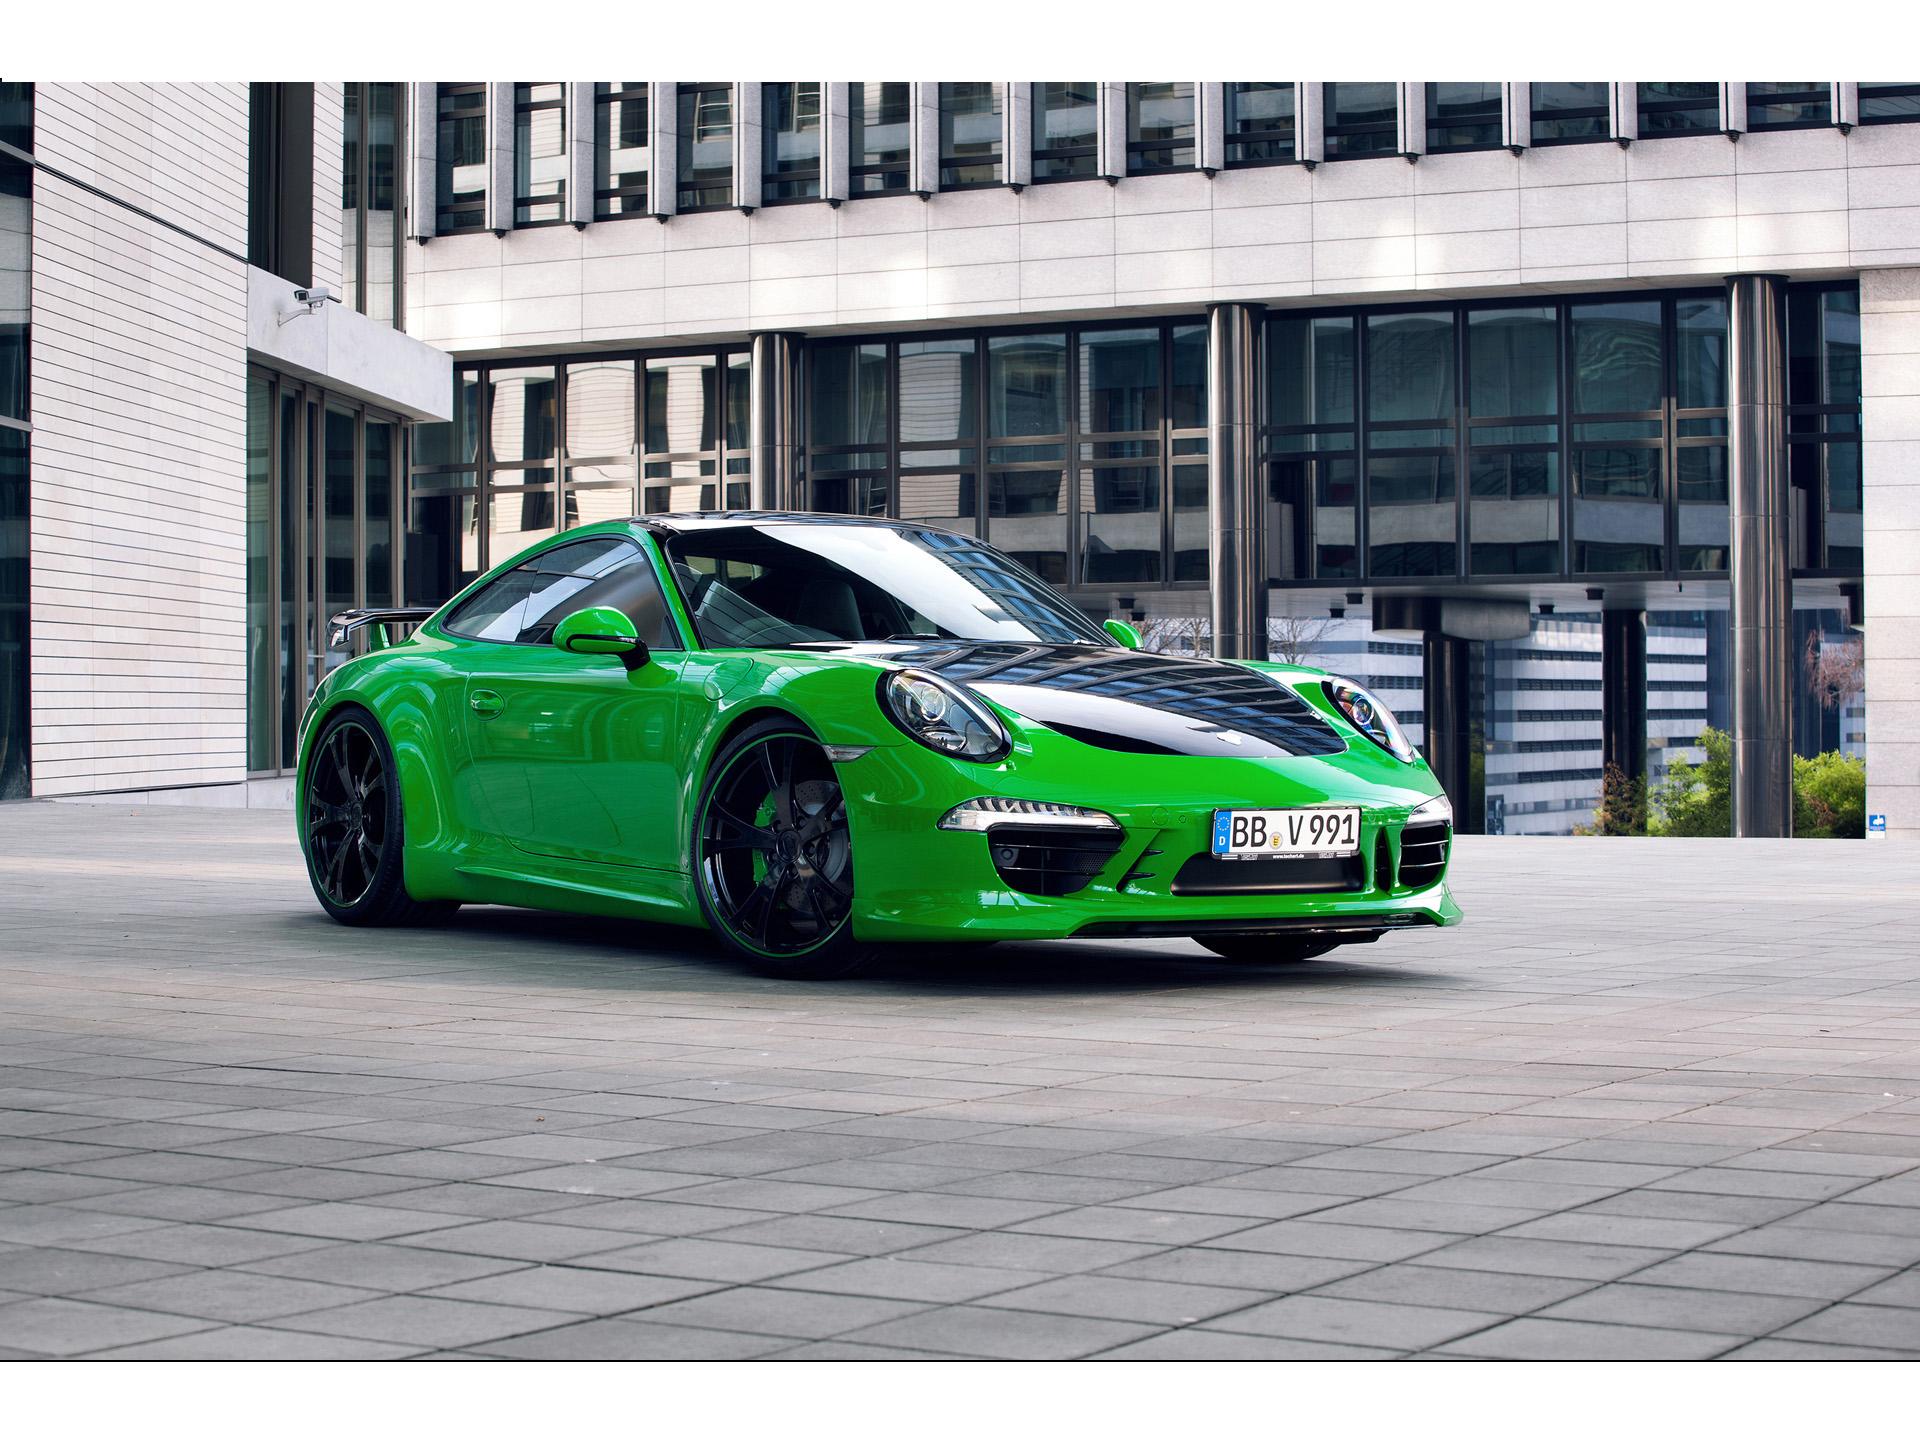 Green Car Modification Wallpaper 2013 Techart 911 Carrera 4s News And Information